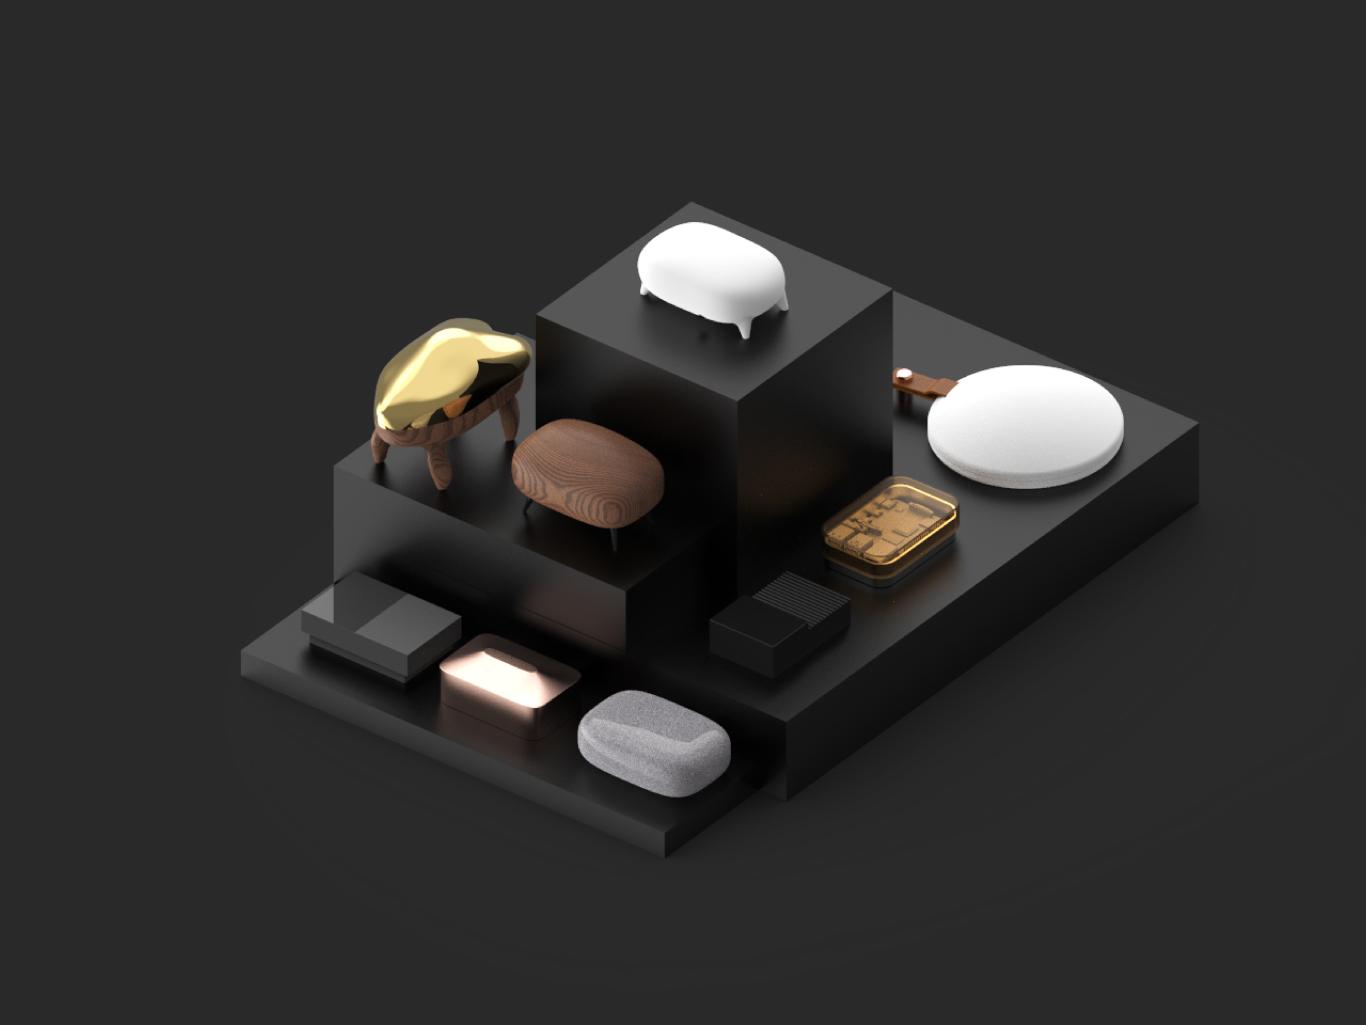 Custom Raspberry Pi 4 B Case Design Concepts